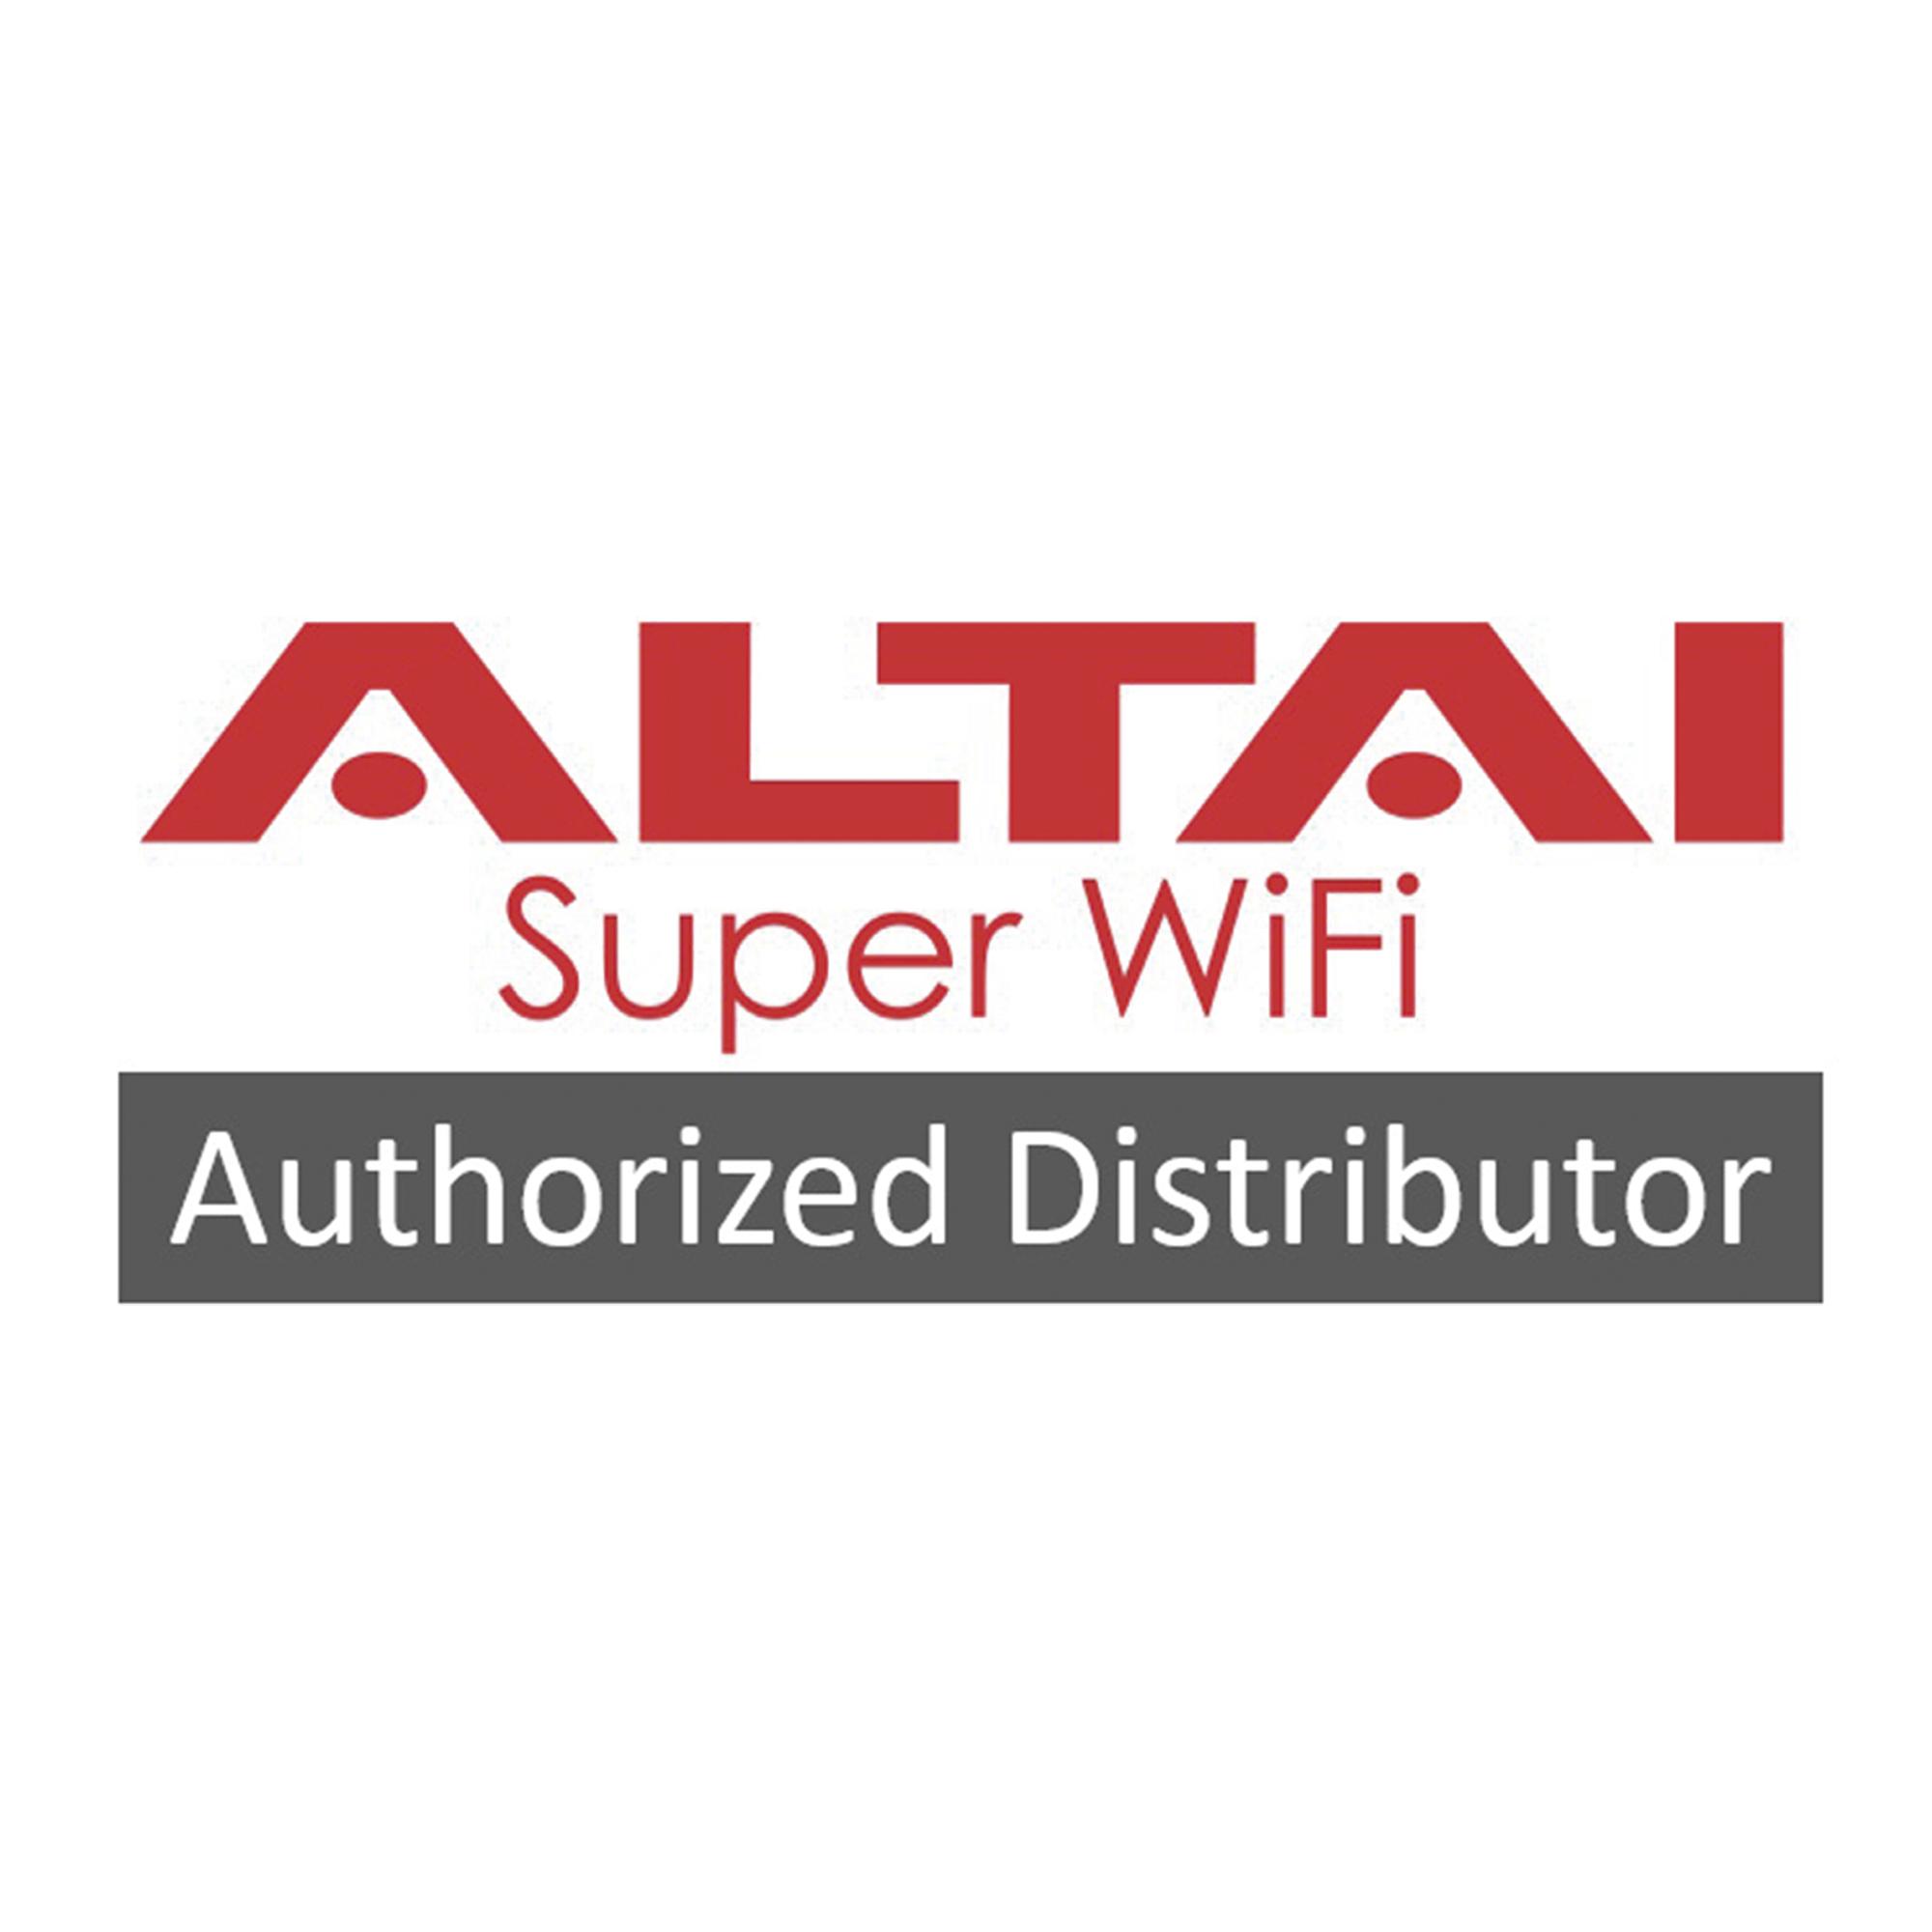 Licencia para actualización hasta 10 puntos de acceso en AltaiGate 200